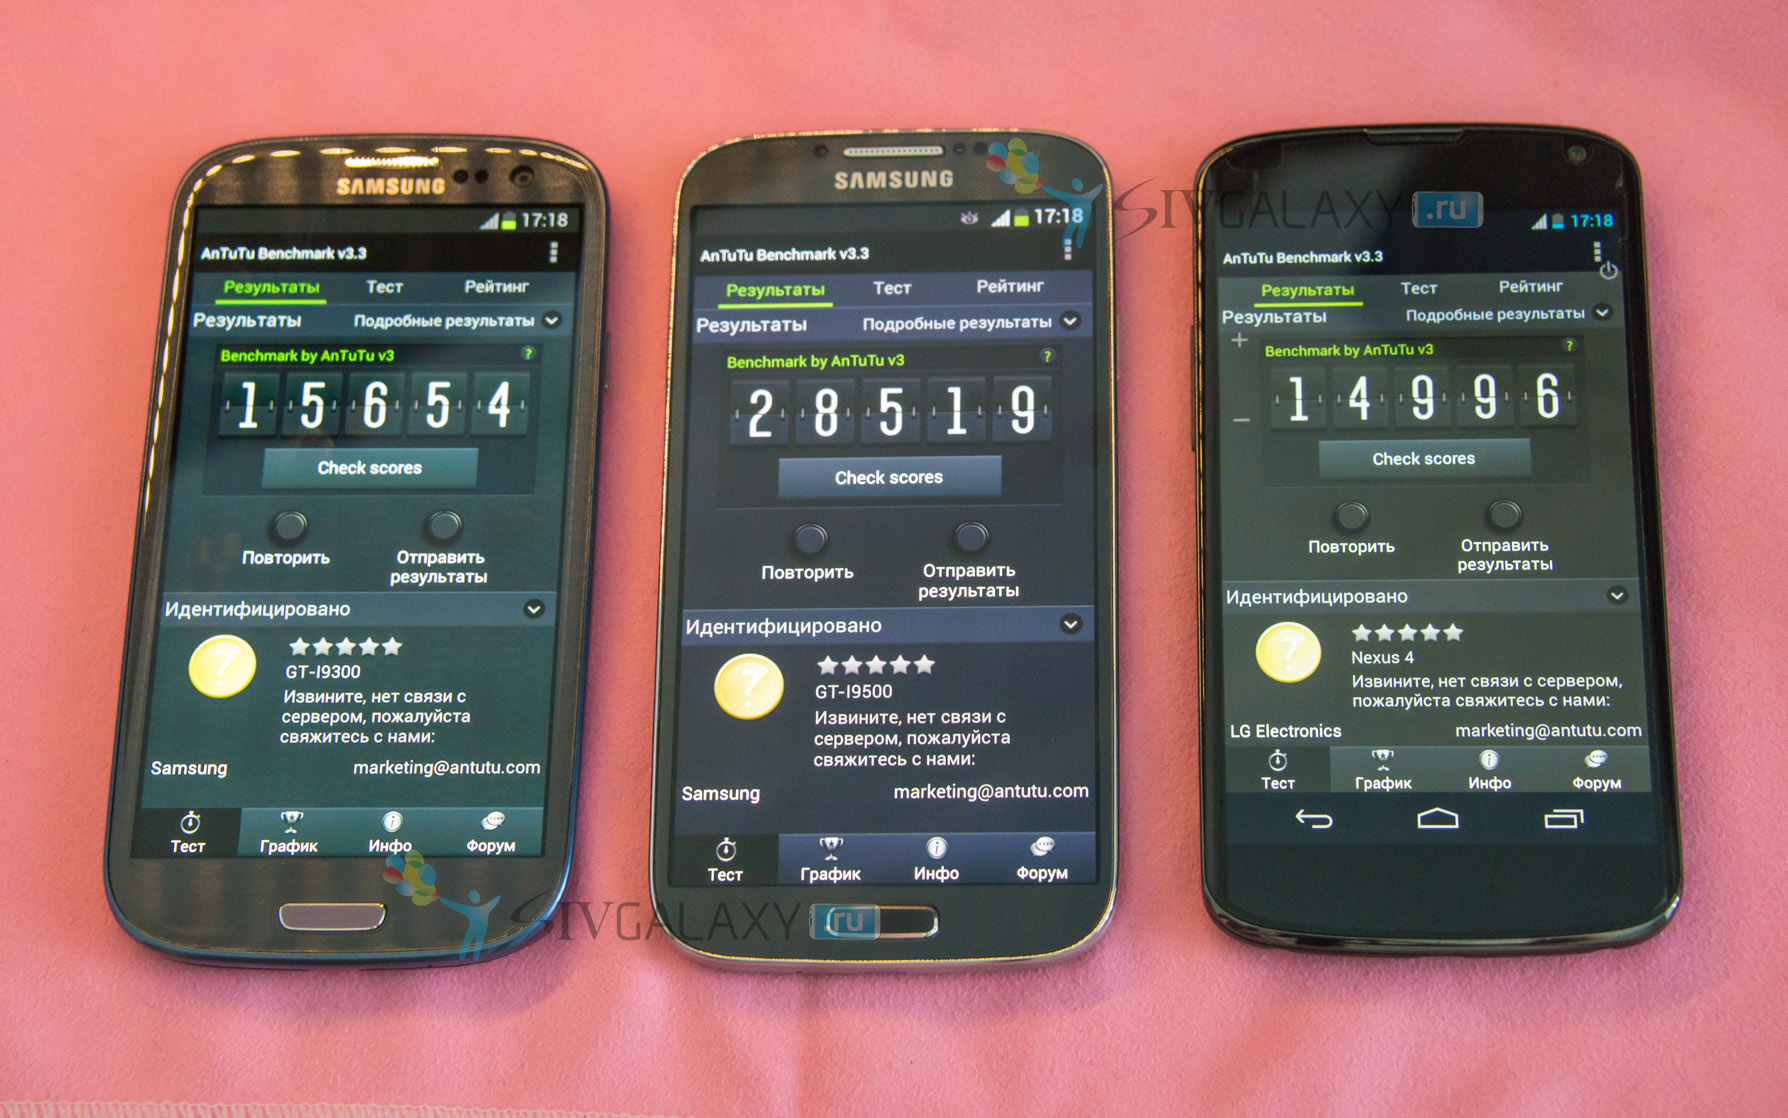 Samsung Galaxy S3 S4 Nexus 4 тесты